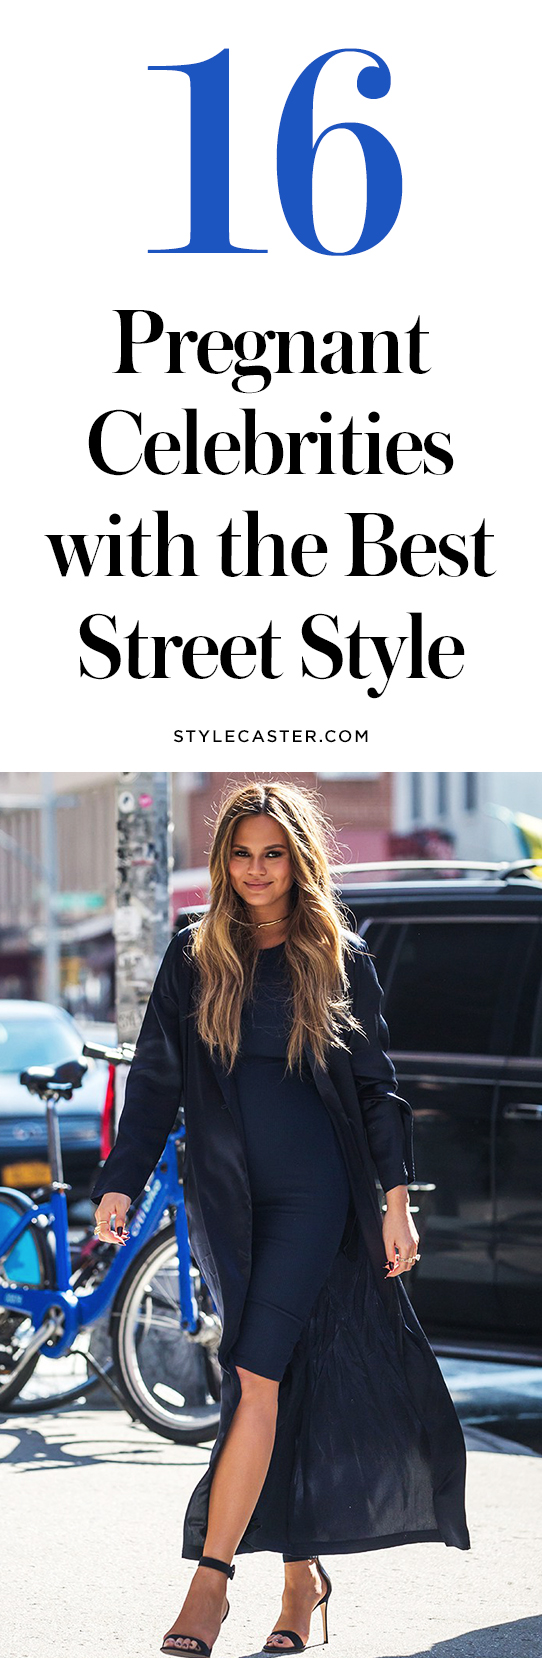 The best pregnant celebrity street style | @stylecaster